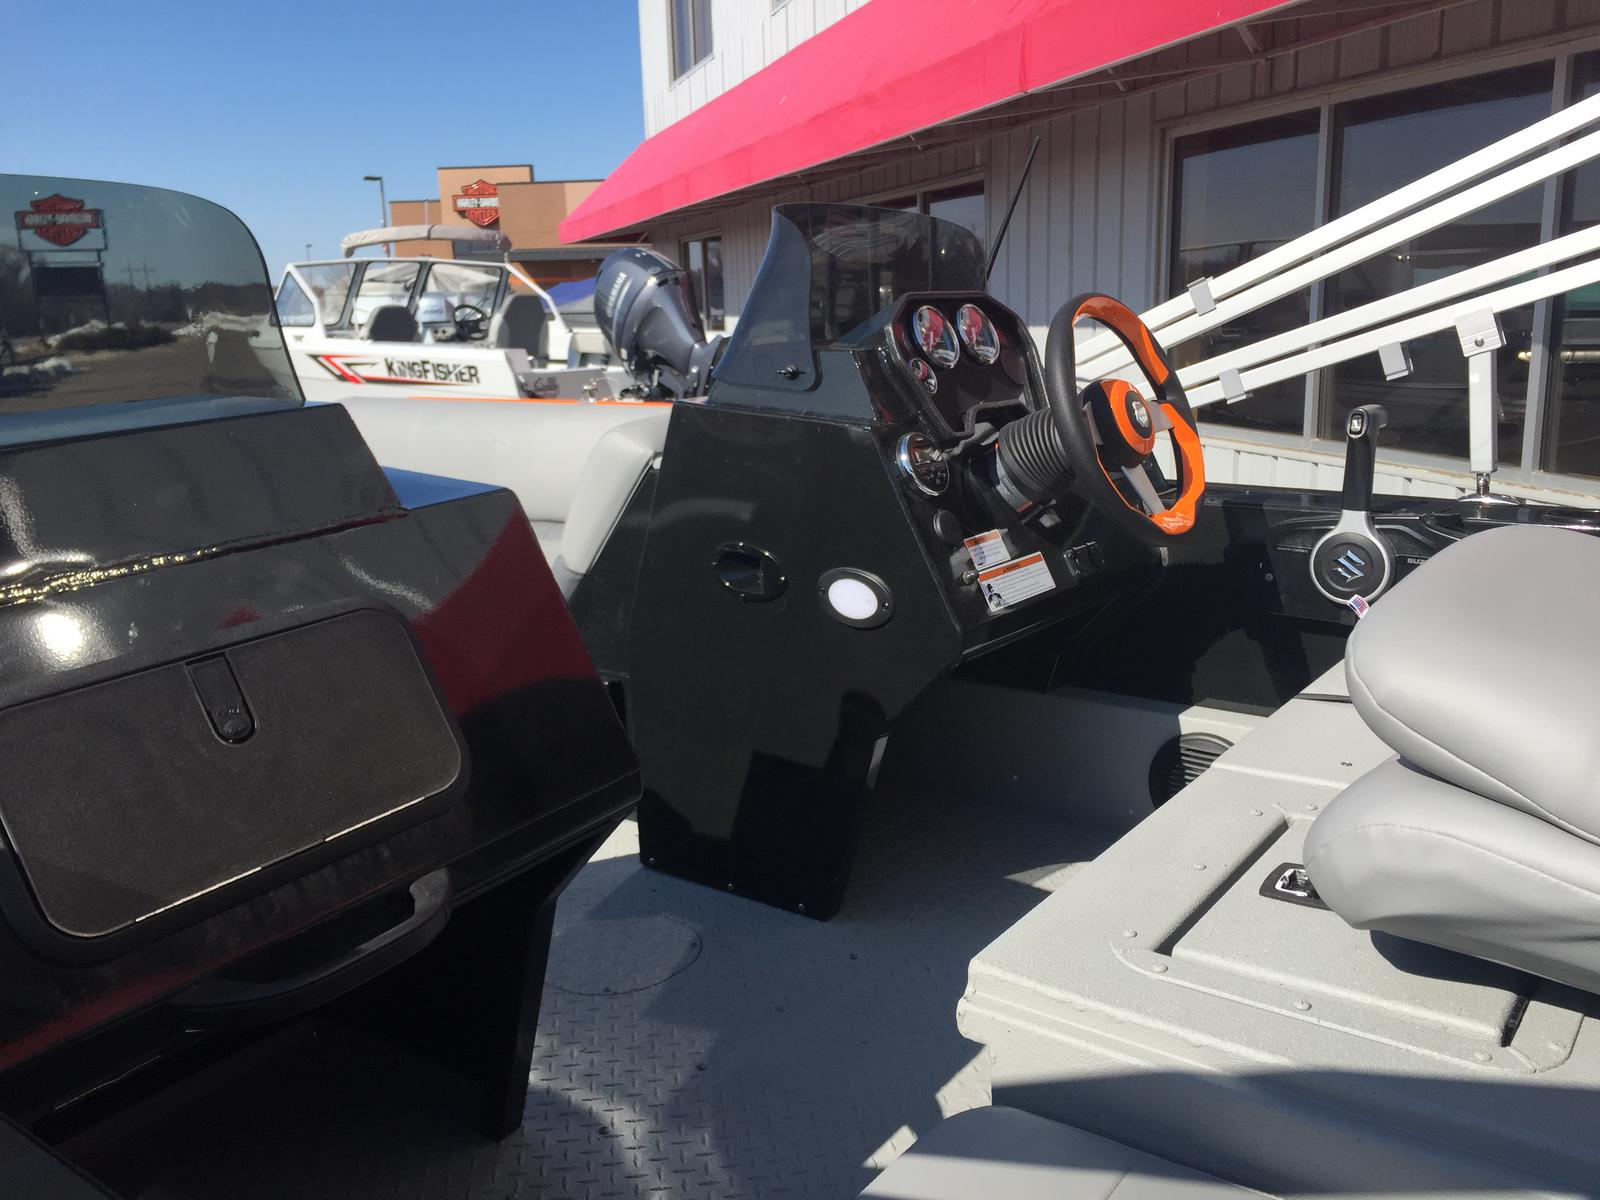 2019 SeaArk Easy 200 for sale in Delano, MN  Foster Bros